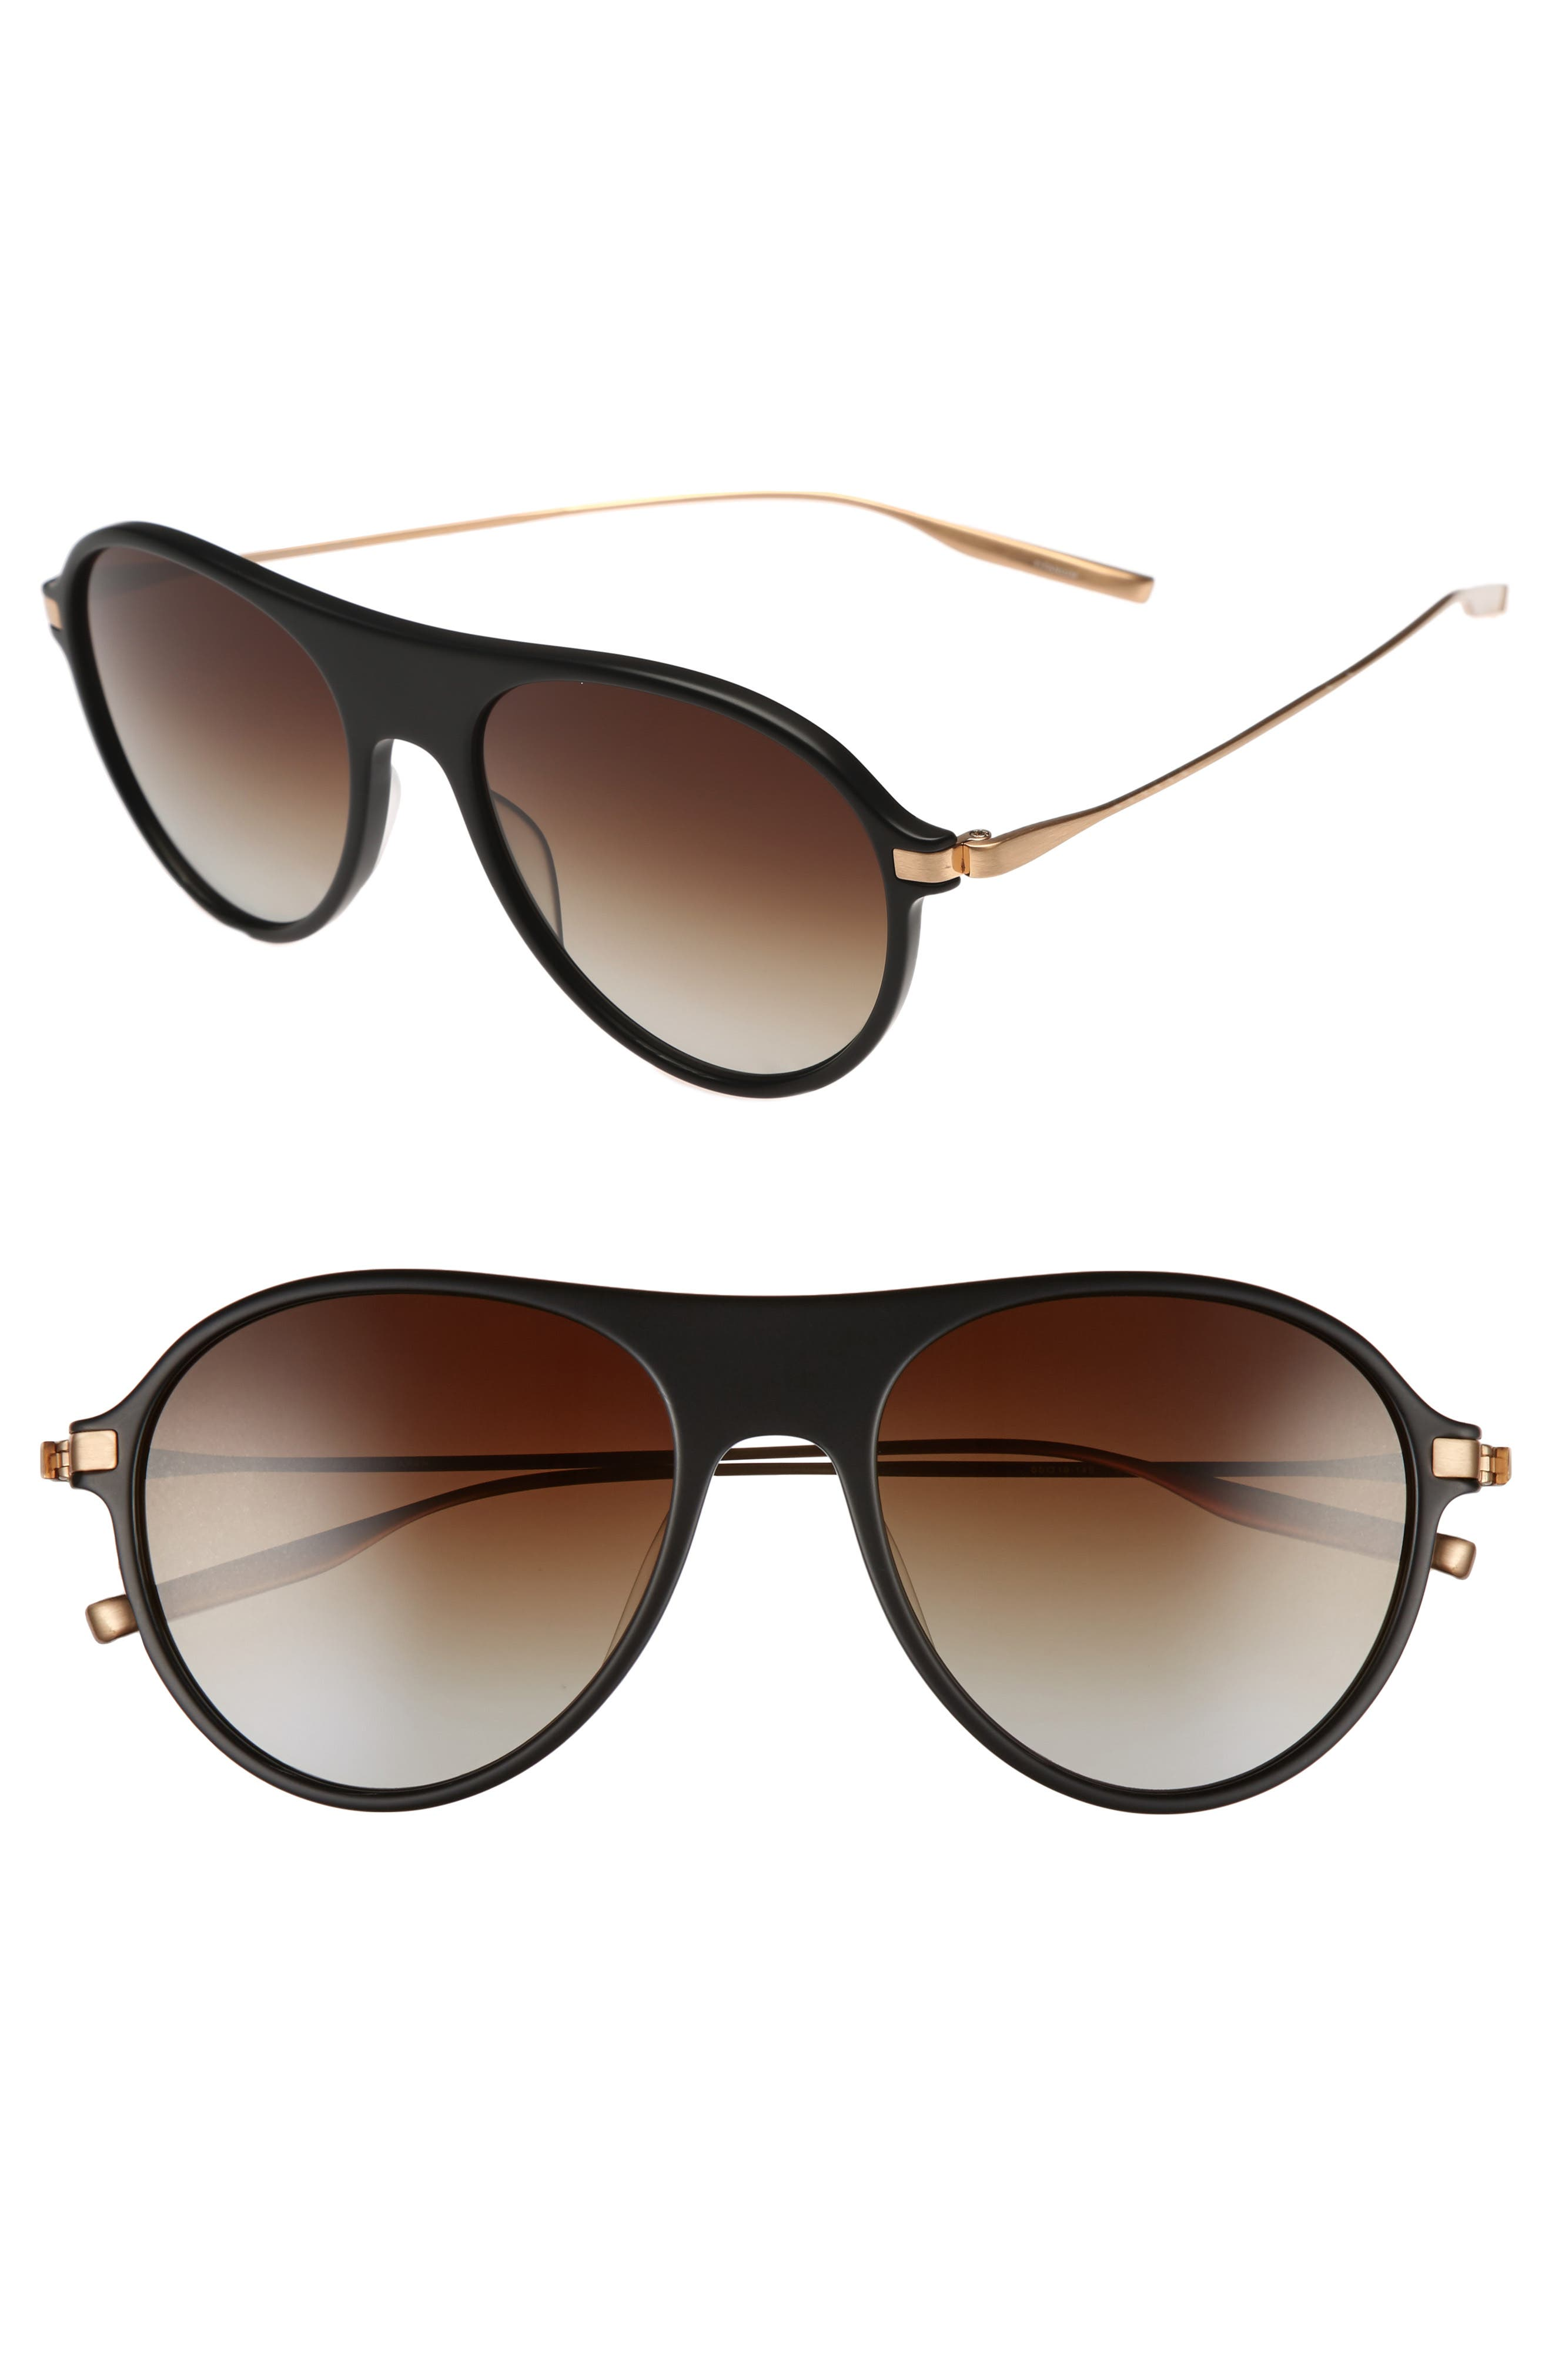 St. Hubbins 55mm Polarized Sunglasses,                         Main,                         color, MATTE BLACK / BRUSHED HONEY